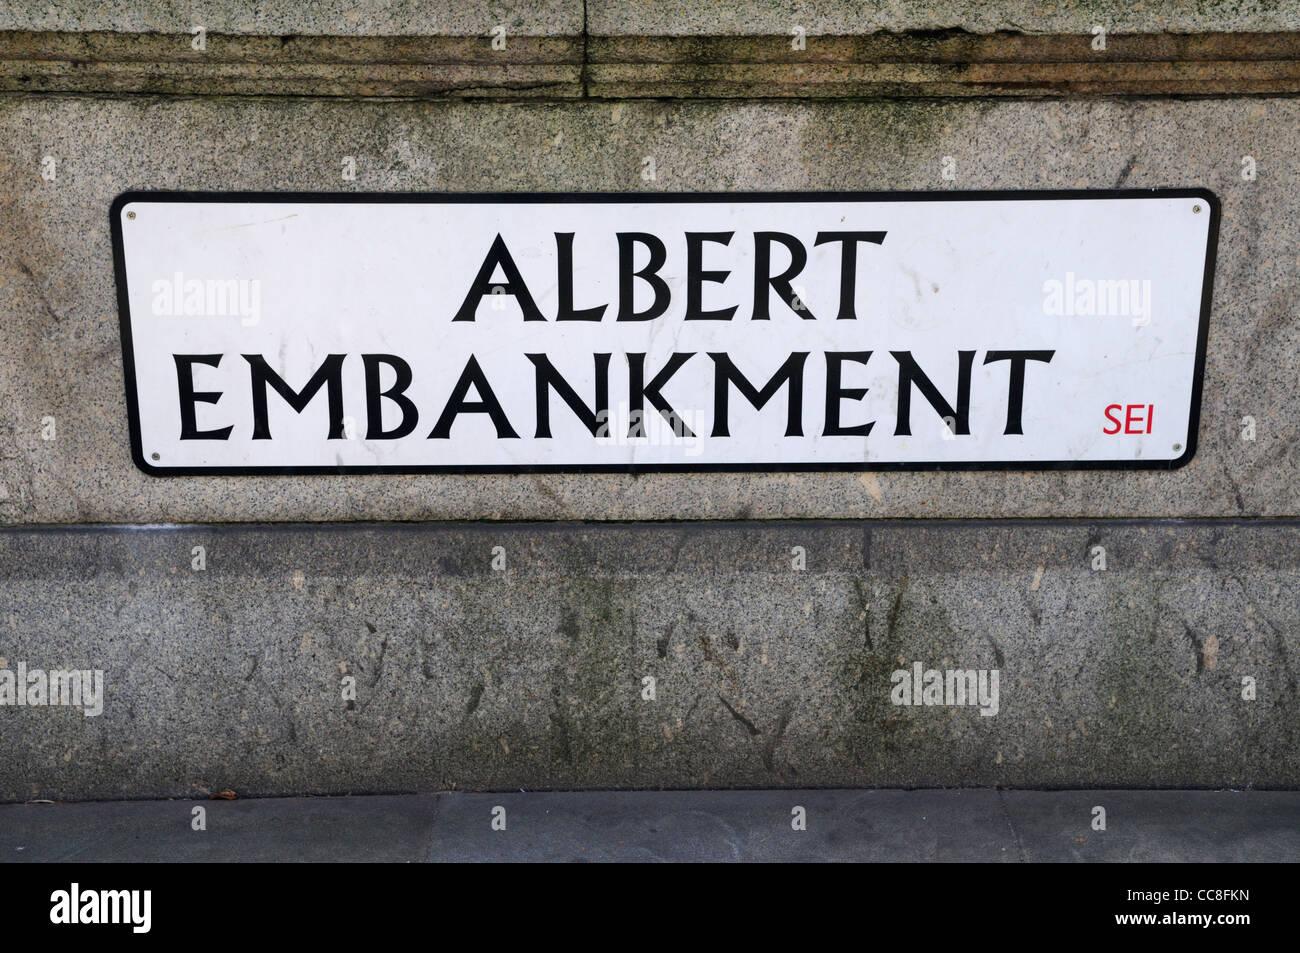 Albert Embankment Street Sign, London, England, UK - Stock Image